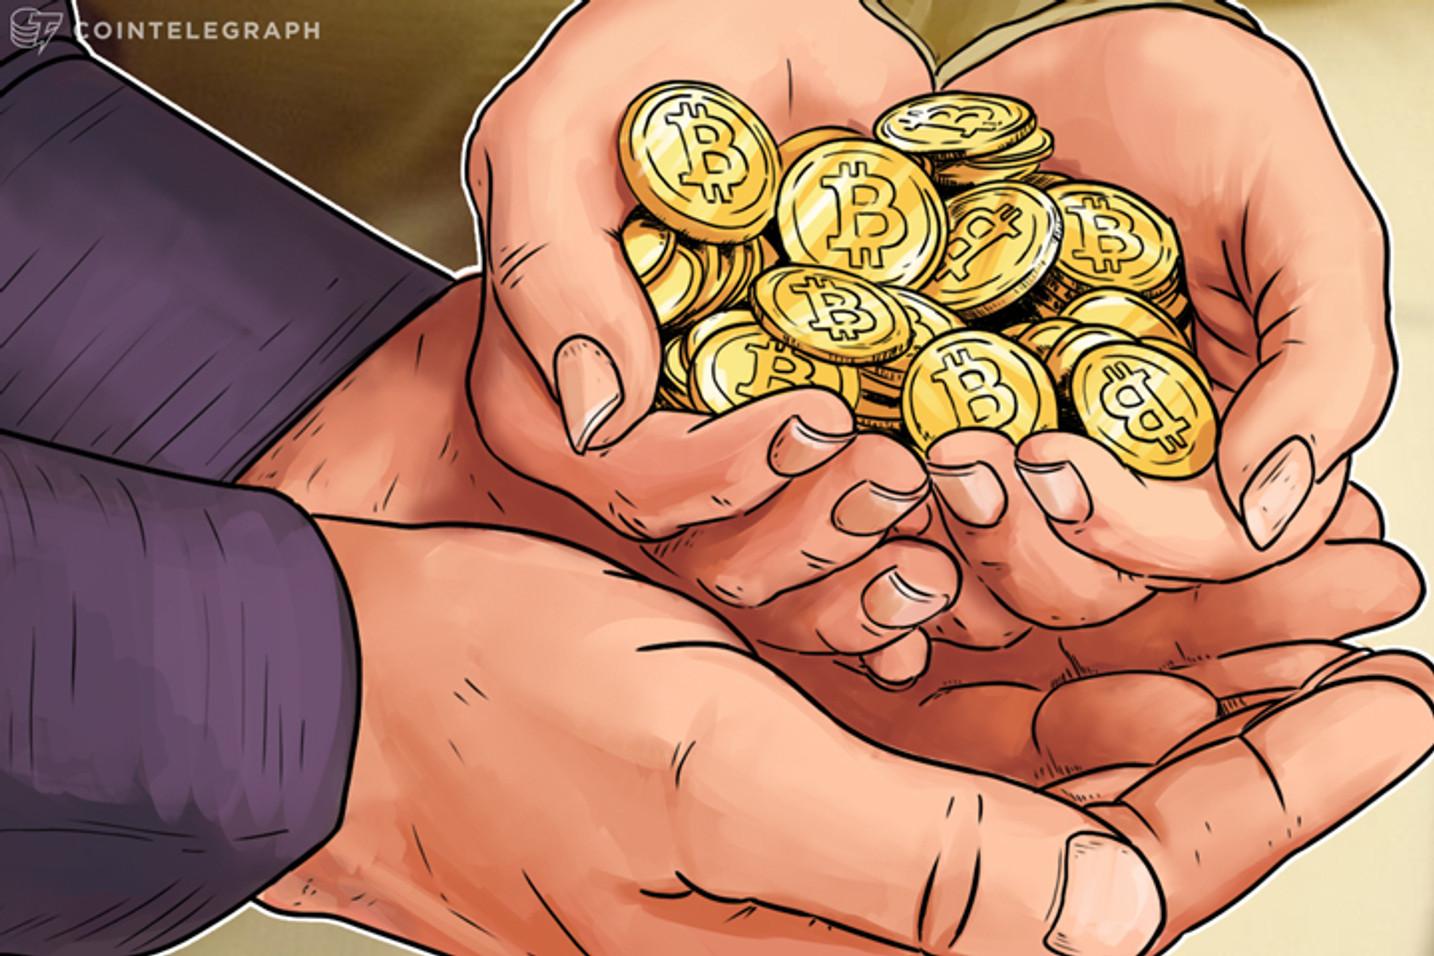 Fondo de caridad únicamente de Bitcoin dona $1 millón al Internet Archive